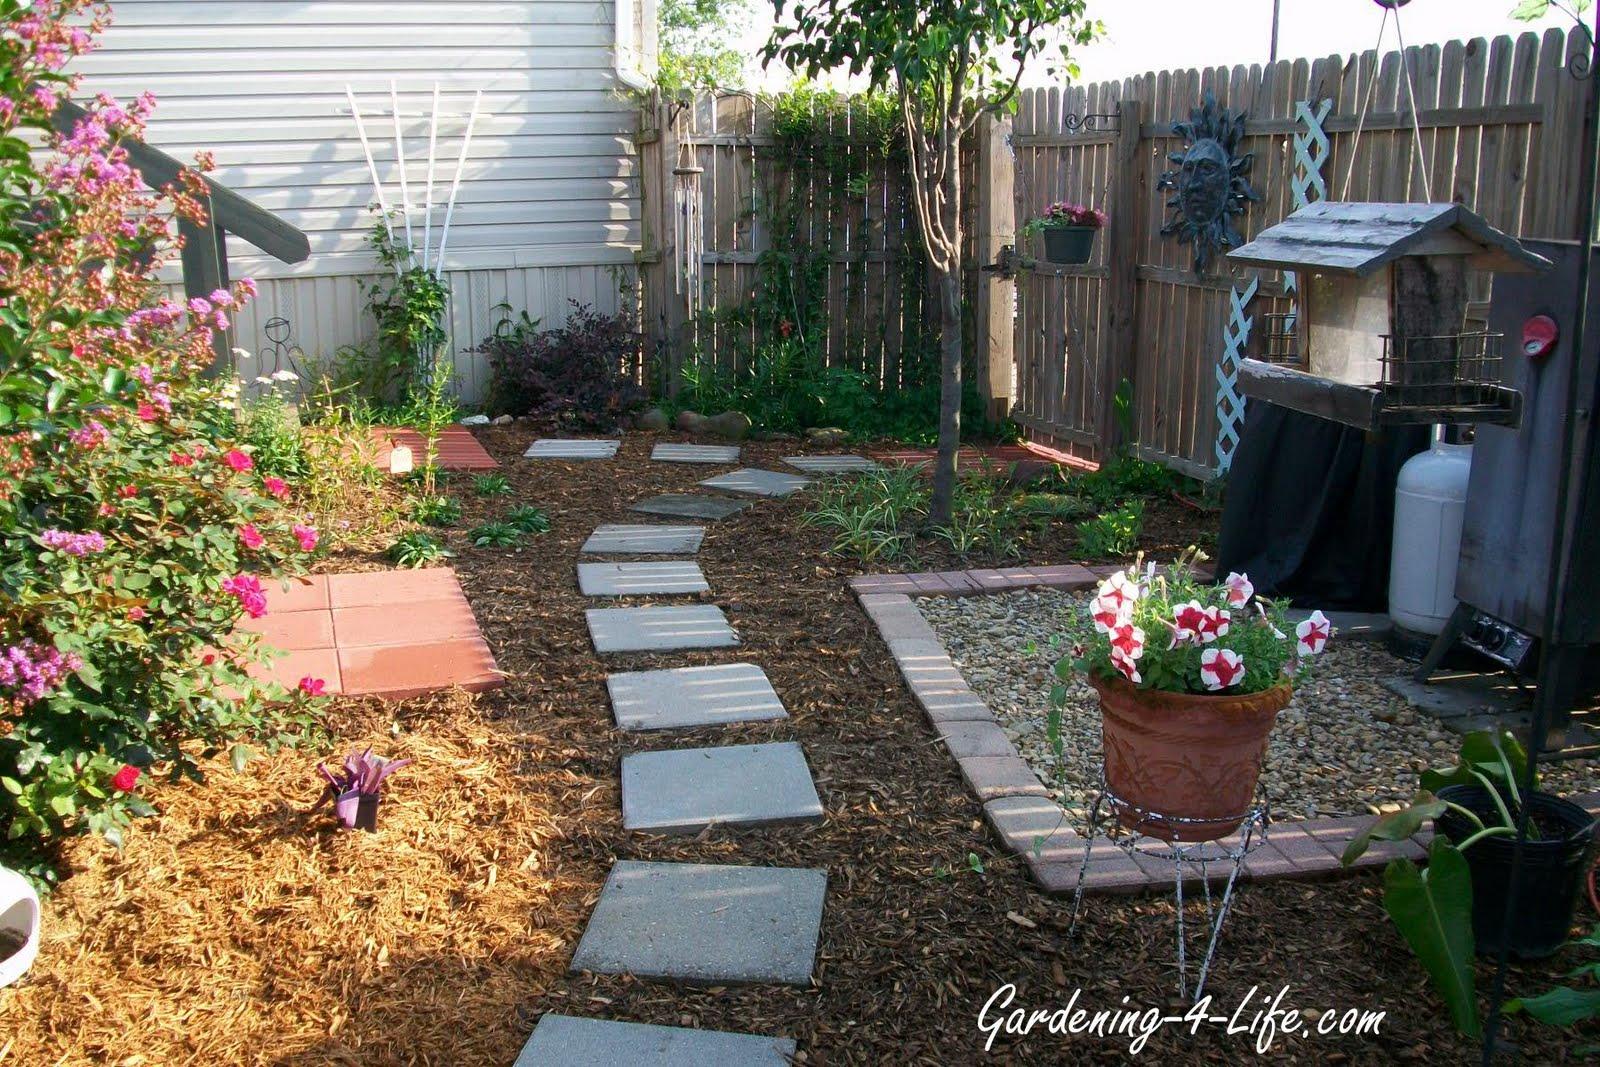 Gardening-4-Life | When Gardeners garden, it is not just ... on Small Backyard Renovation Ideas id=32960